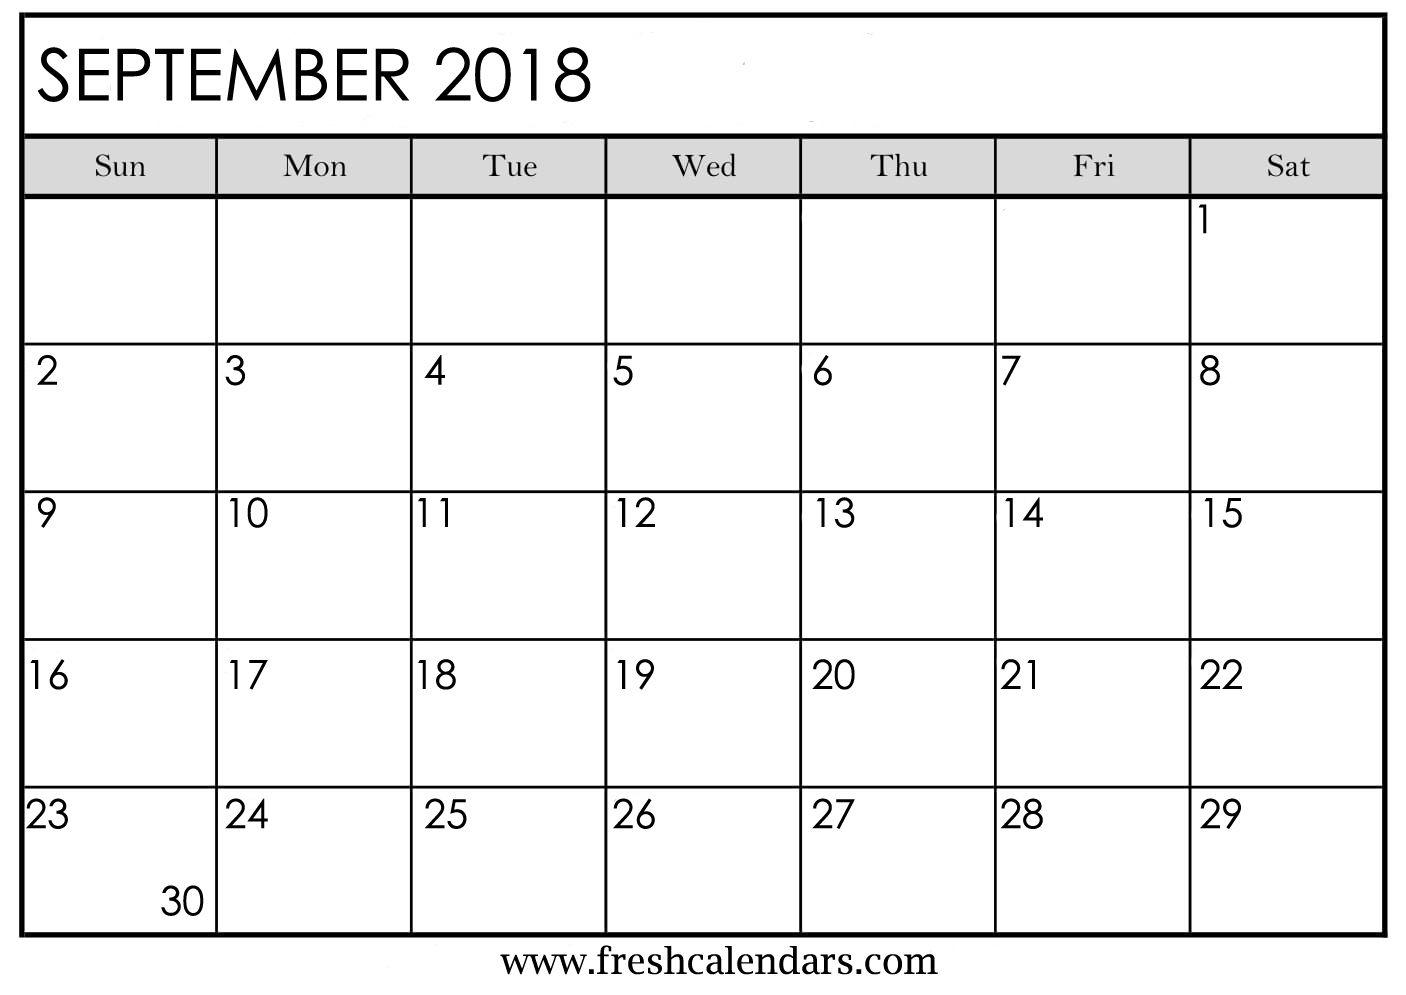 September 2018 Calendar Printable - Fresh Calendars throughout Printable Monthly Calendar Template Aug